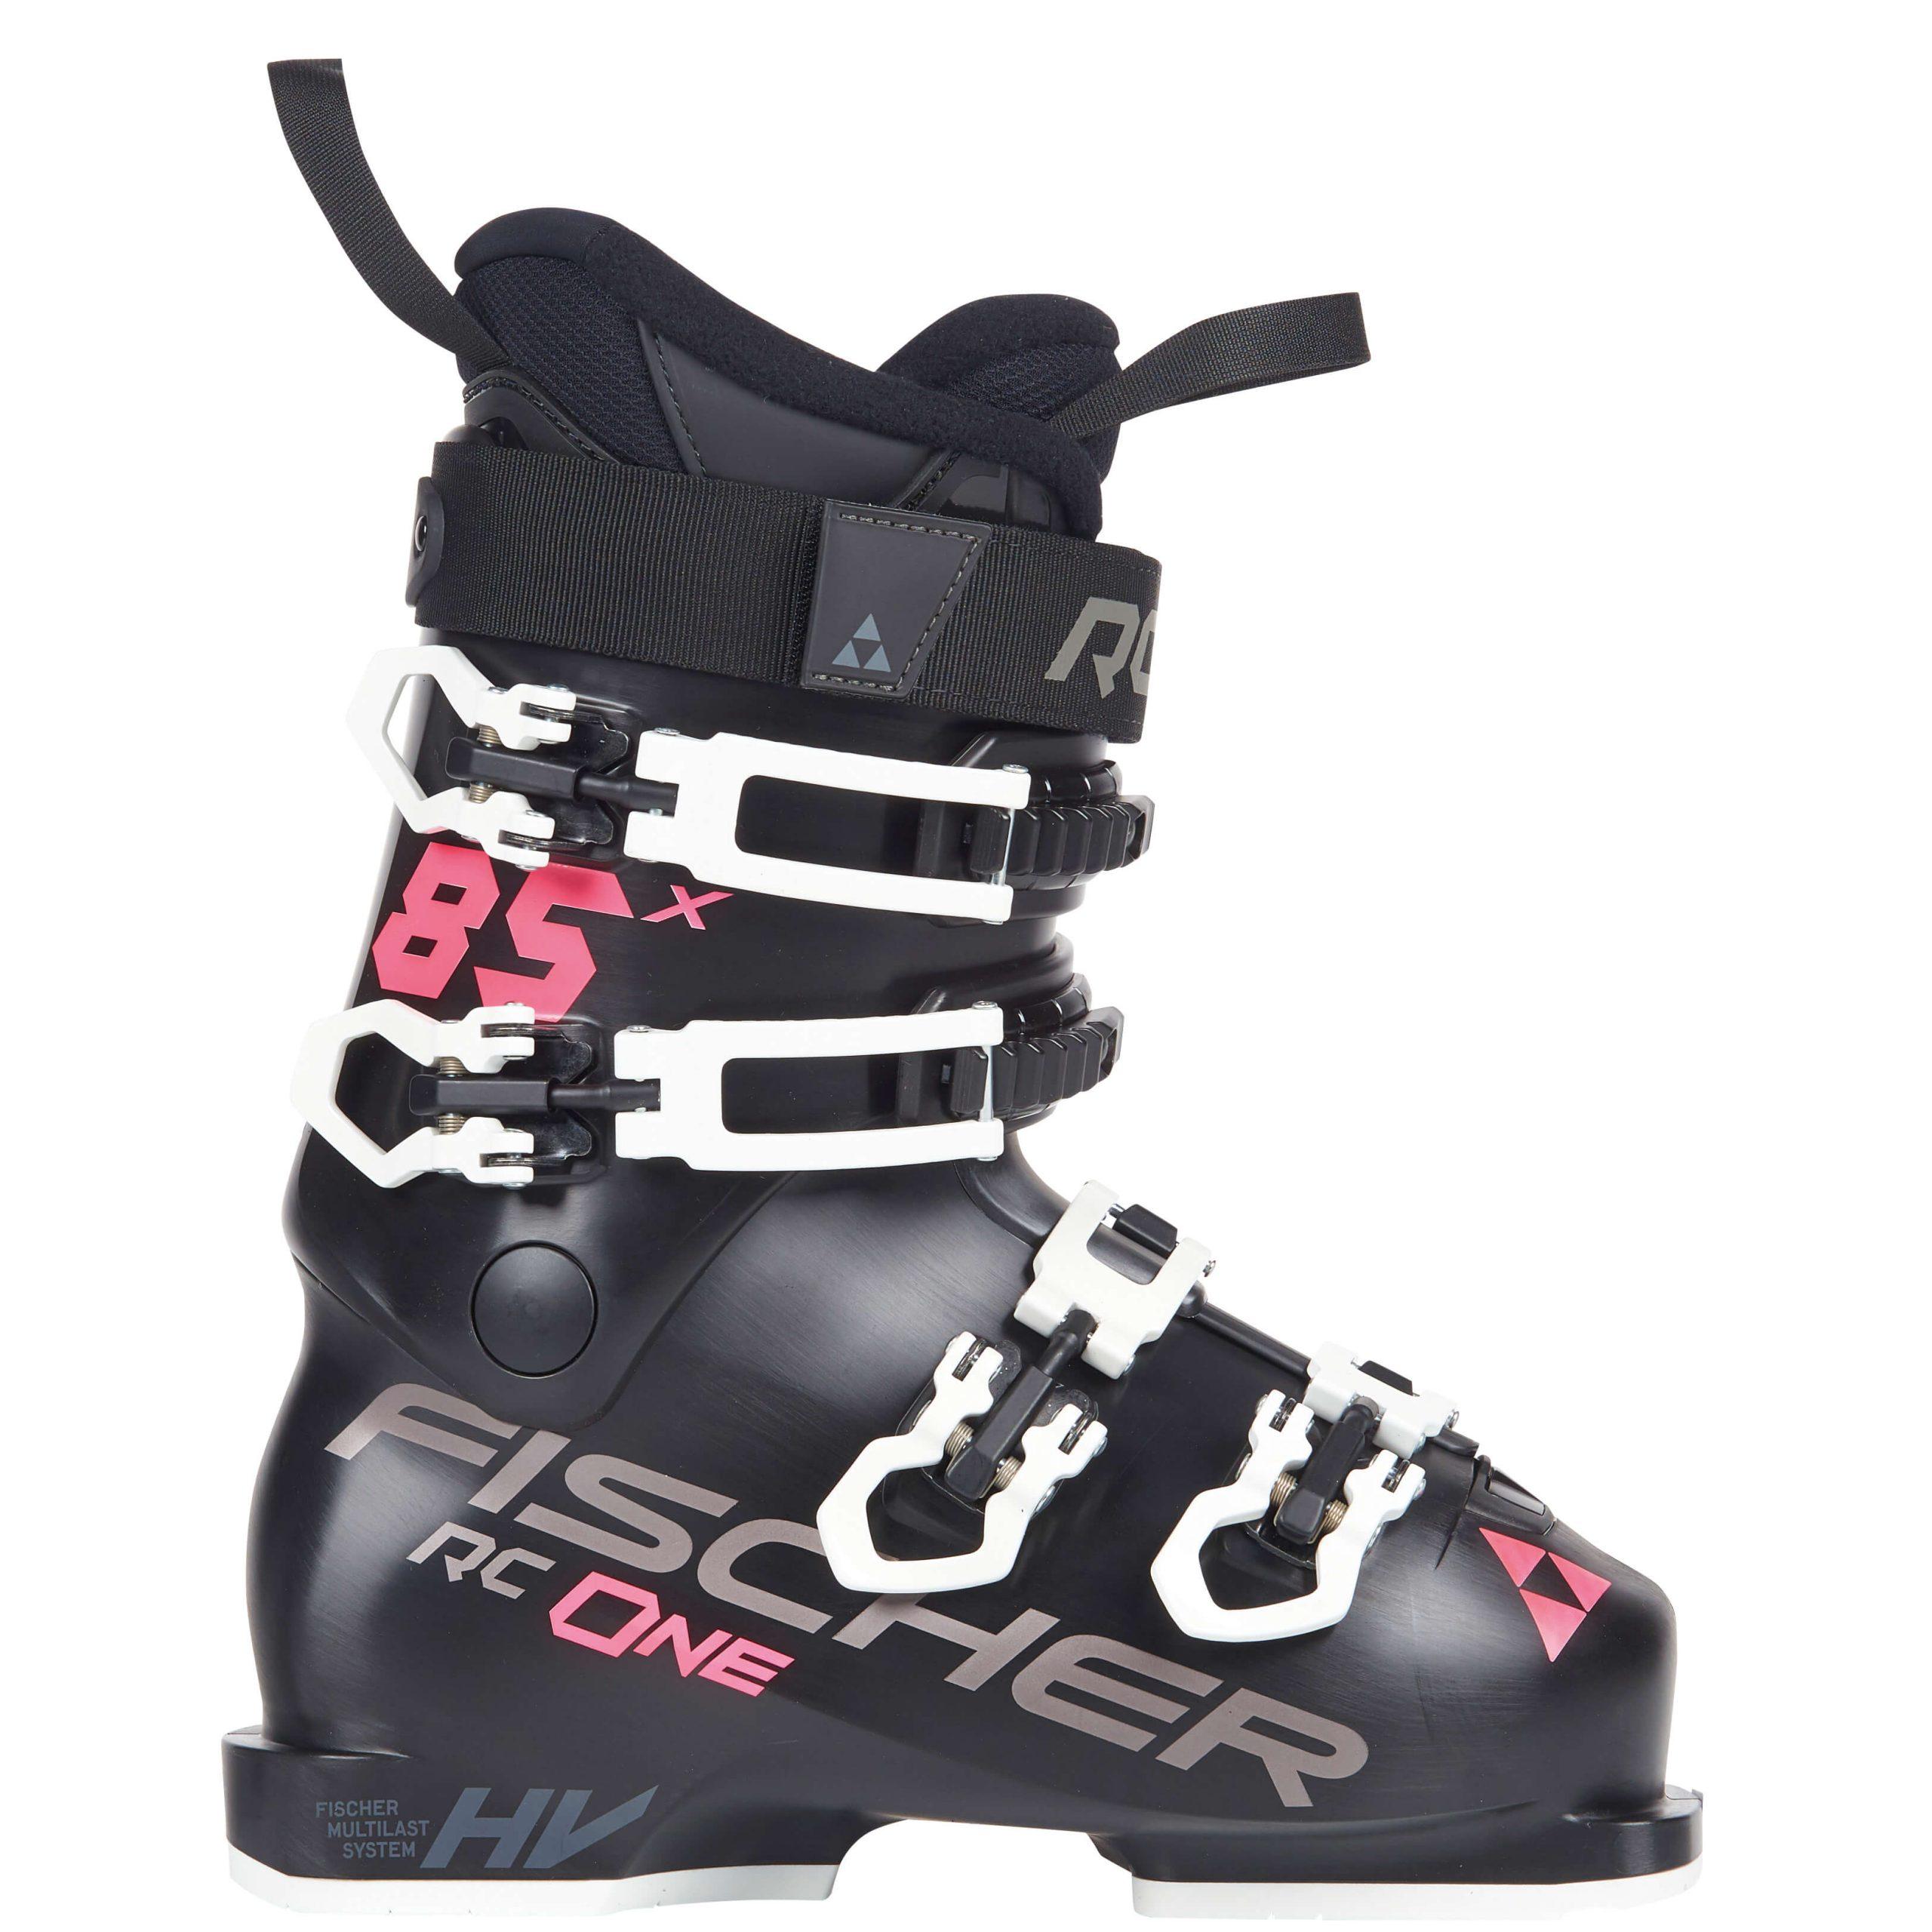 Buty Narciarskie Fischer Rc One X 85 Ws Ts Black Fuchsia 2021 Fischer Ski